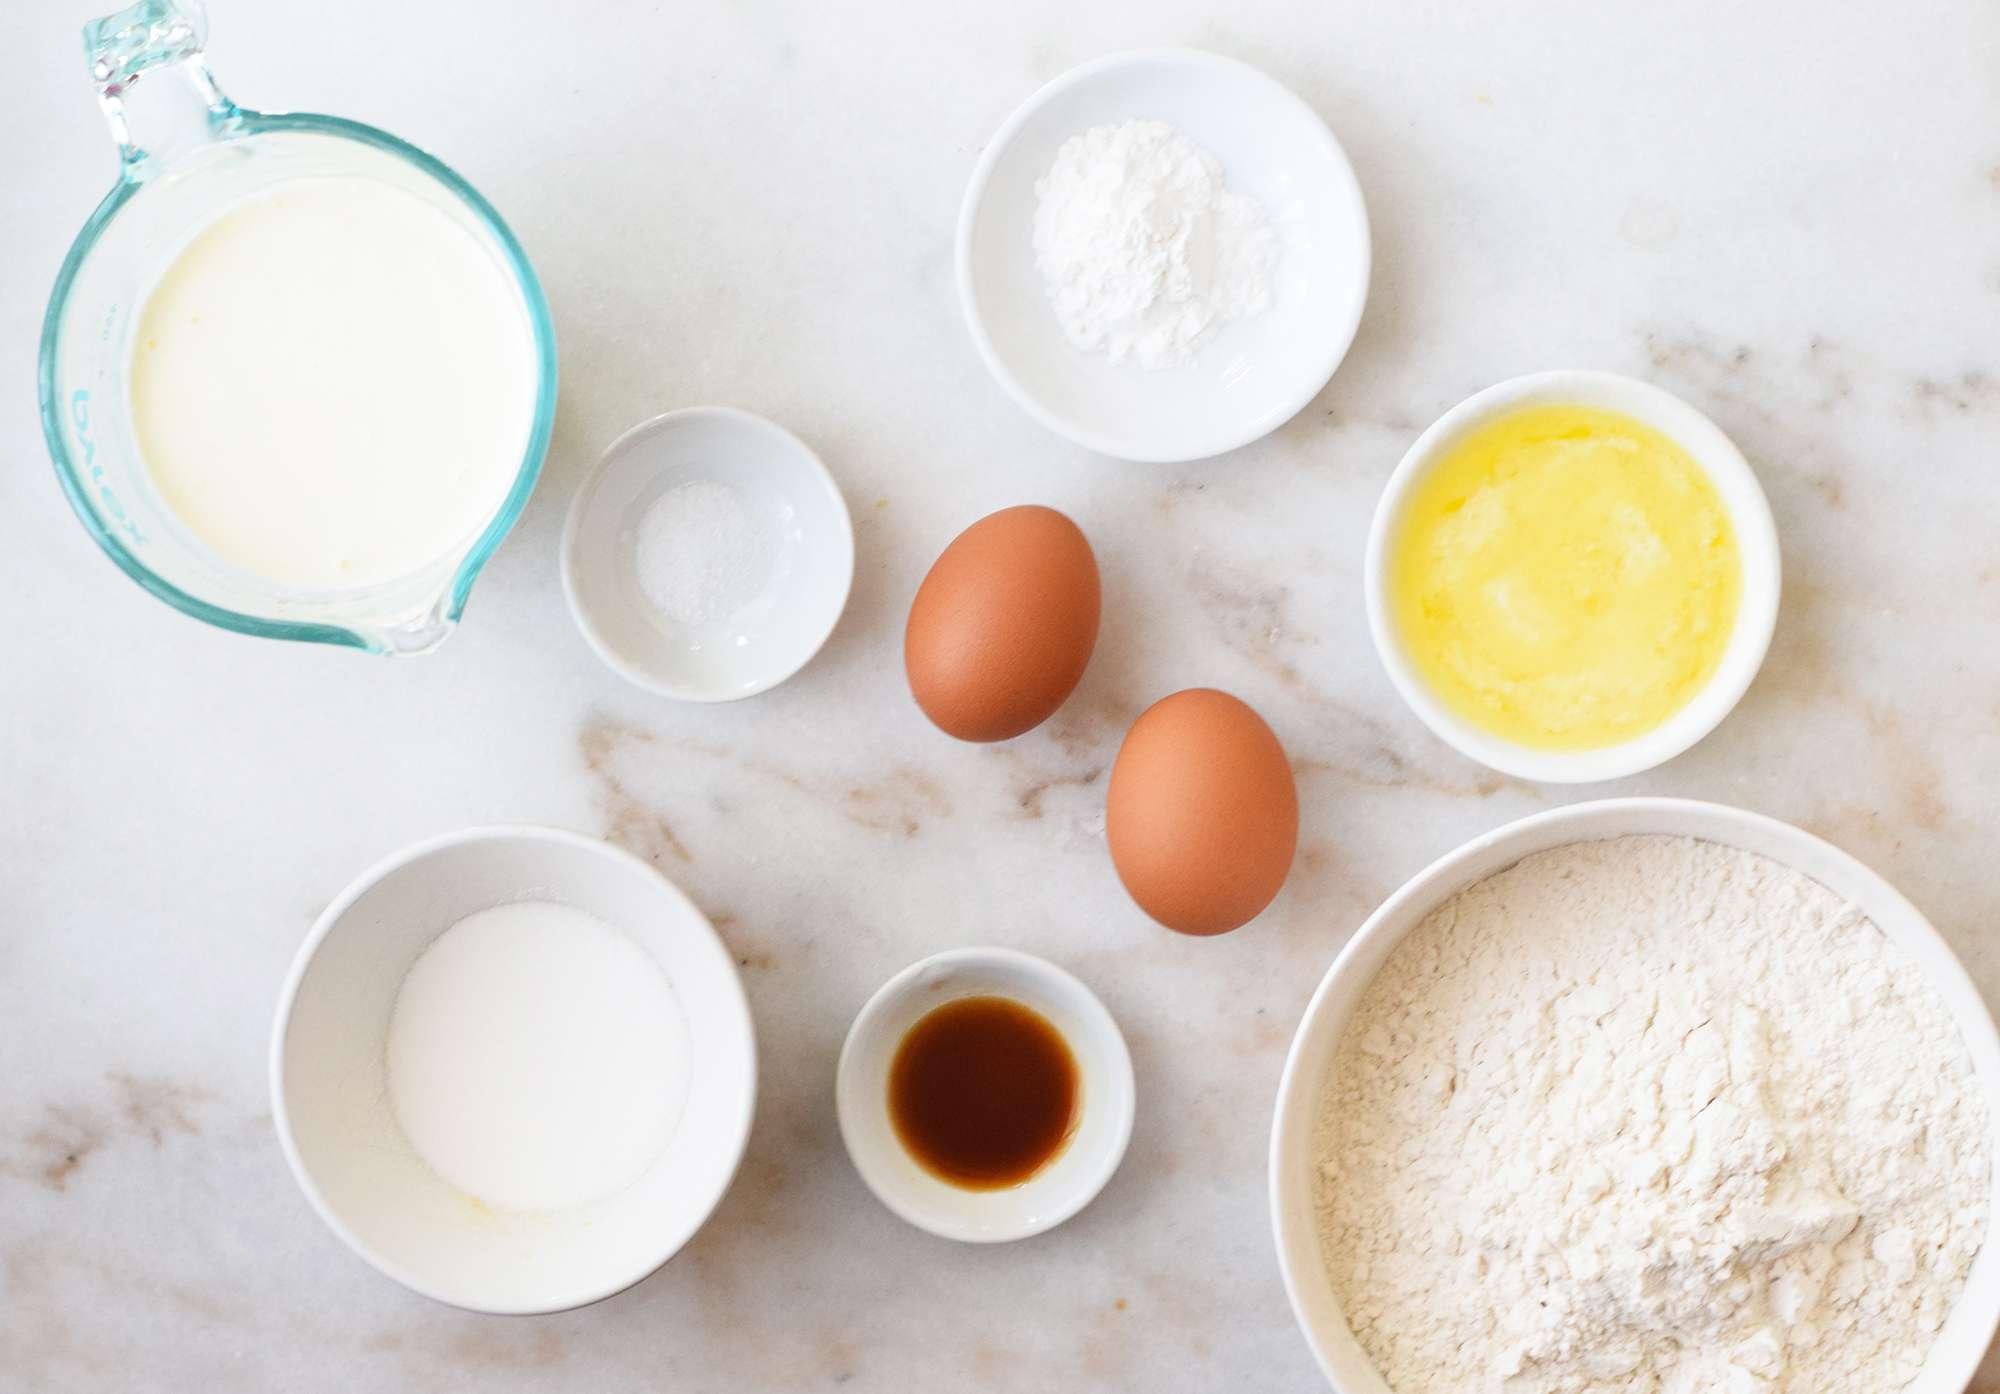 ingredients for instant pot pancake